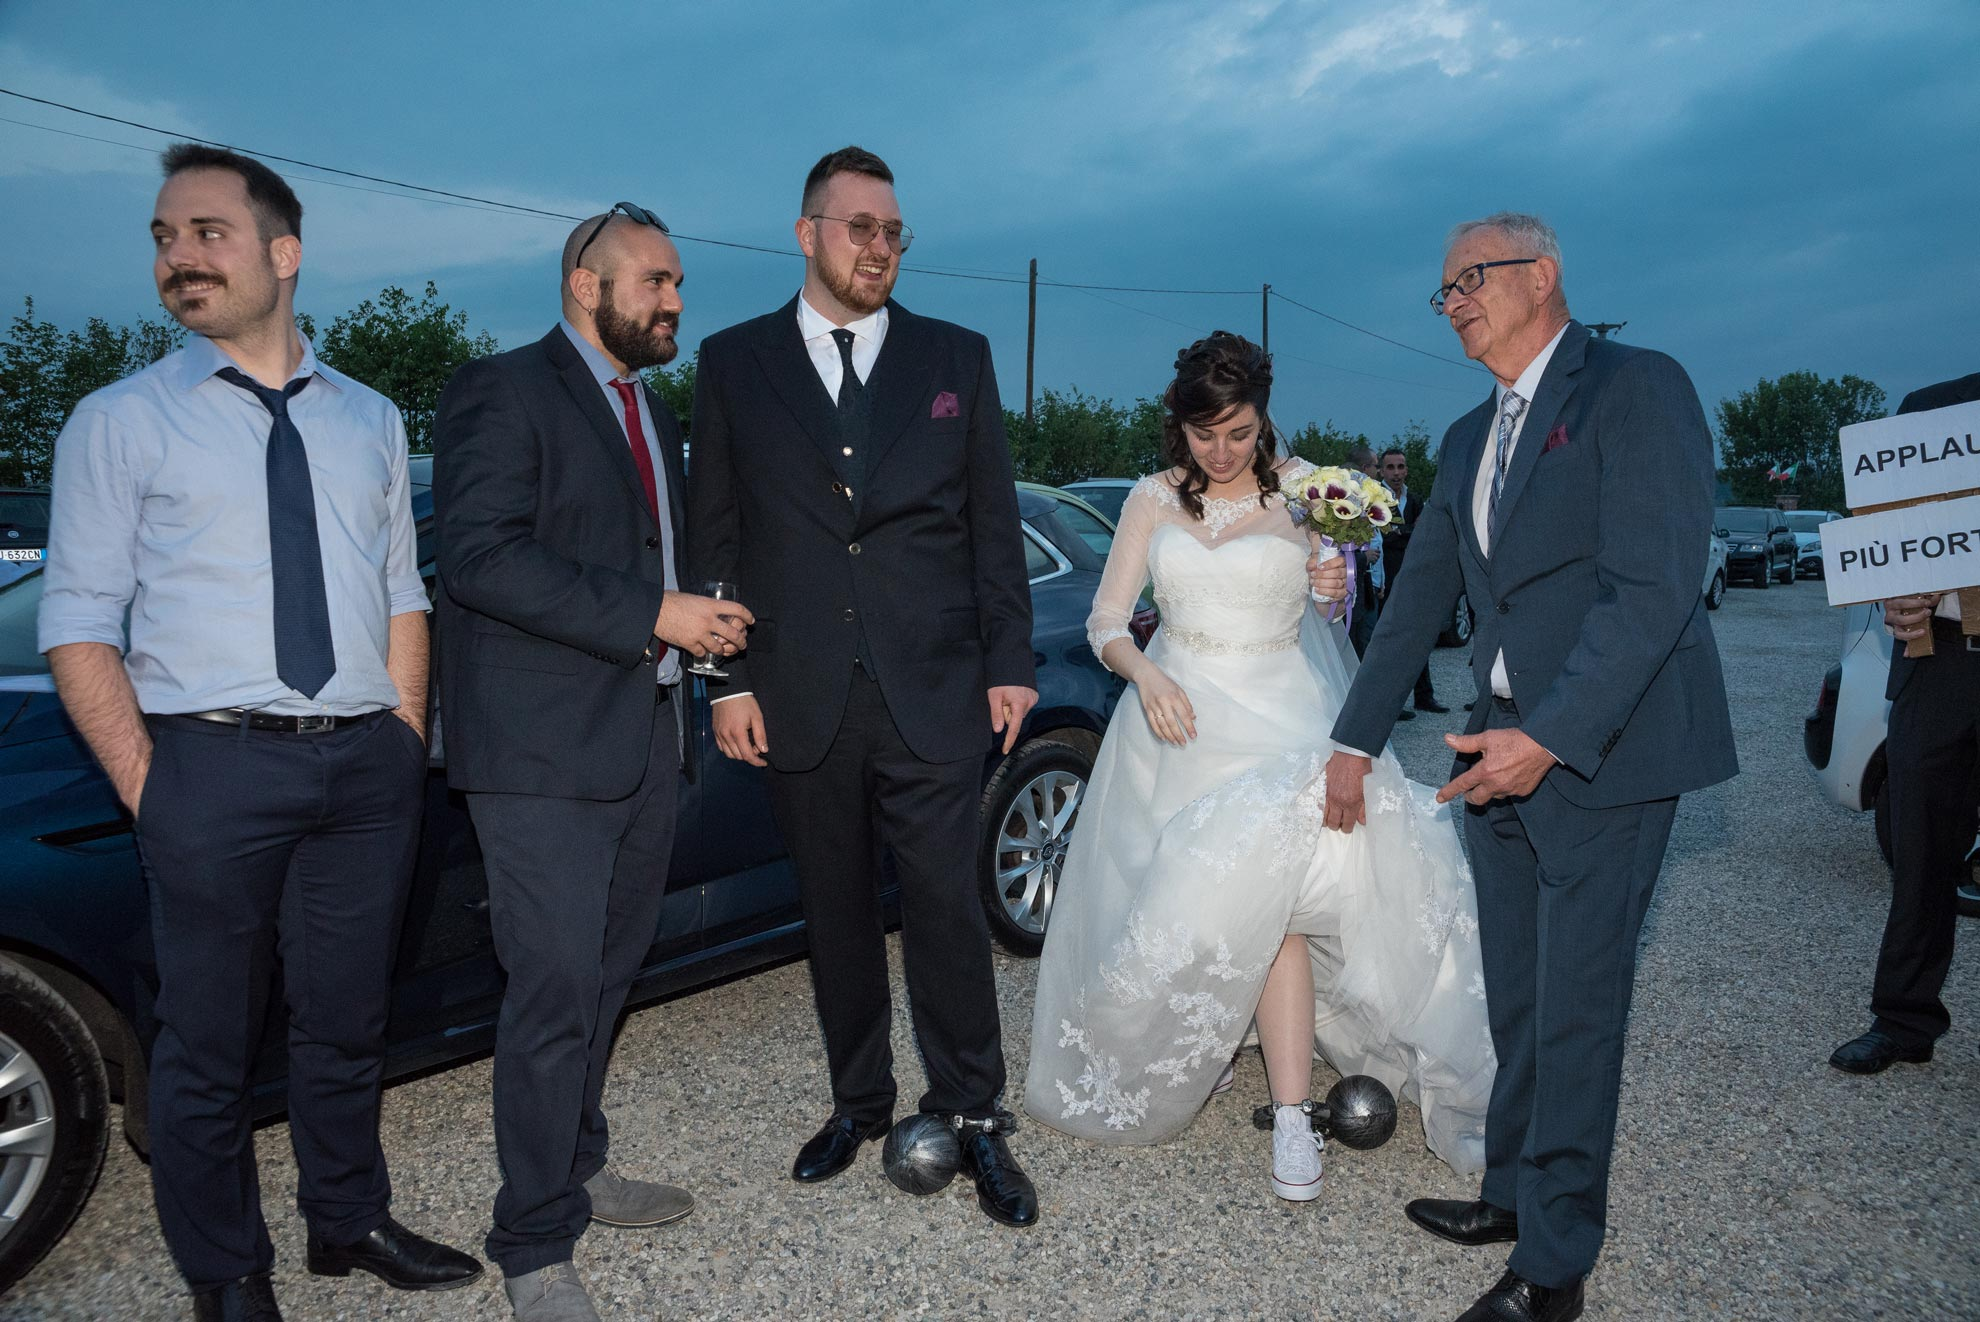 Matrimonio a Narzole Lorenza Diego - DSC 3408 - Fotografie matrimonio scherzi - Fotografie matrimonio scherzi